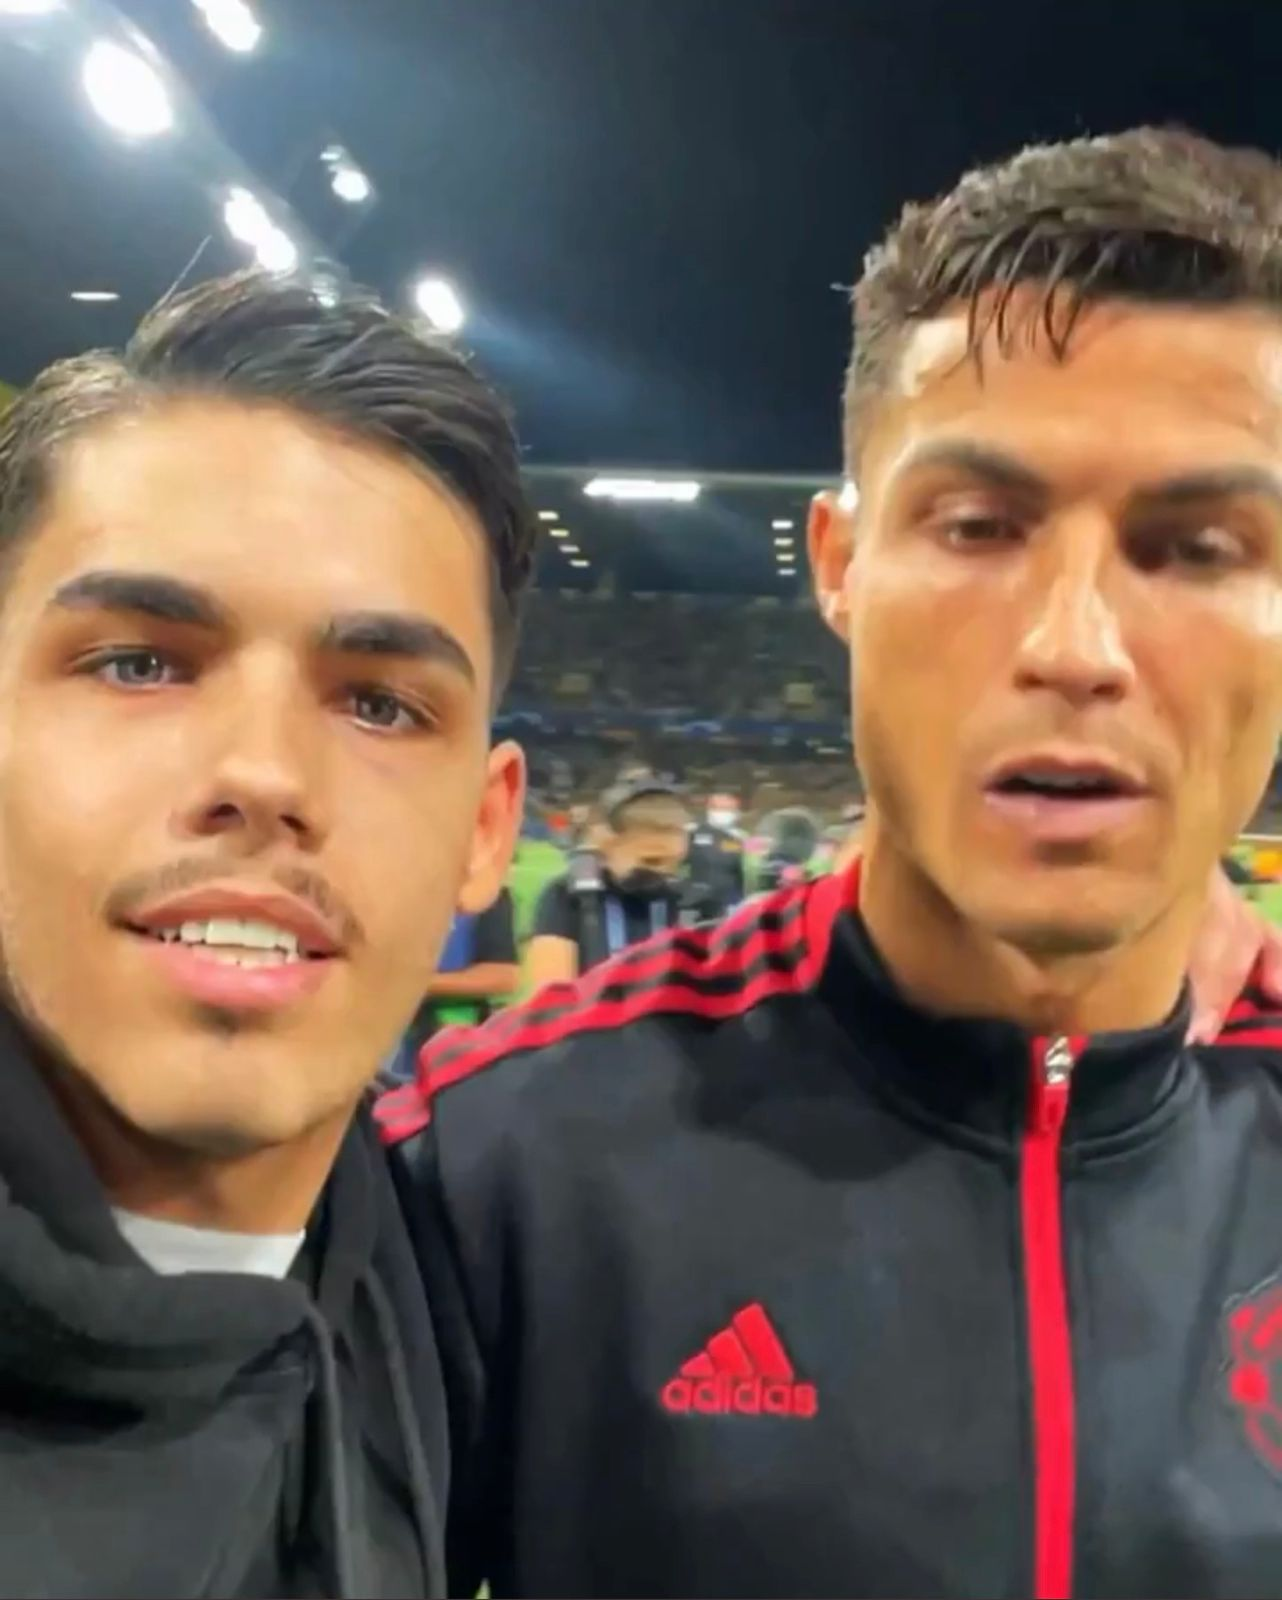 The fan with Ronaldo